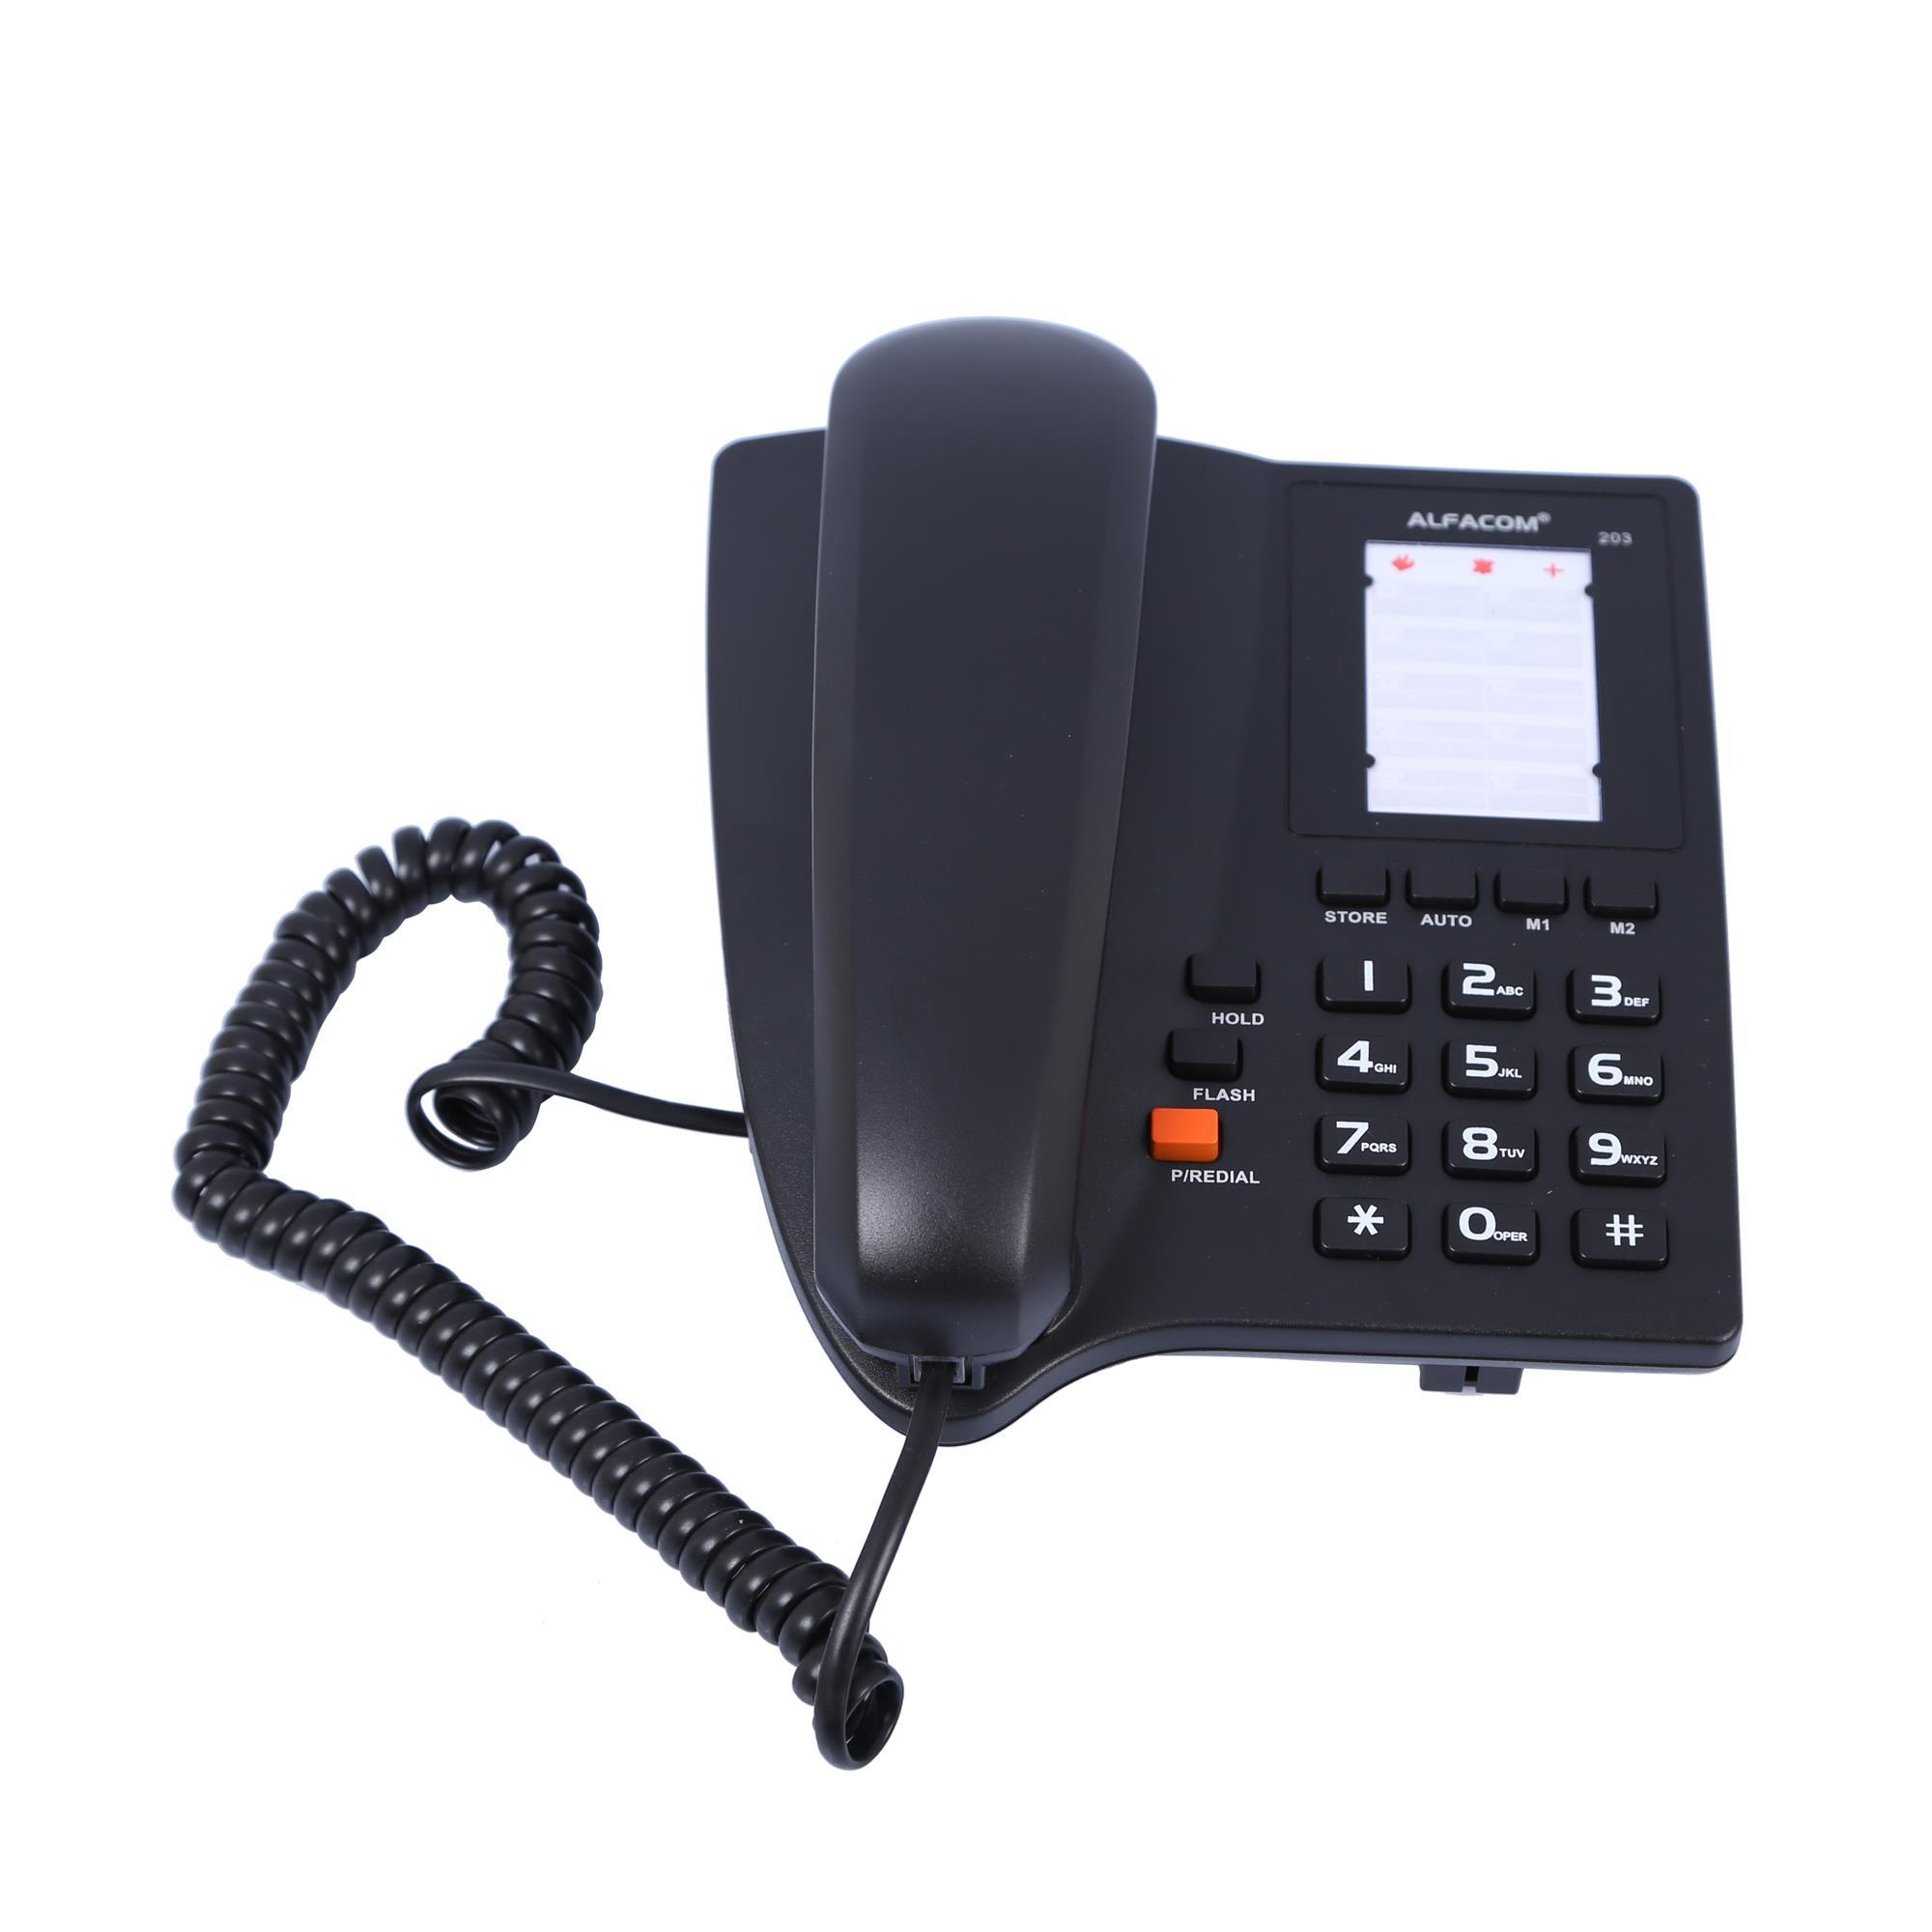 ALFACOM 203 MASA TELEFONU